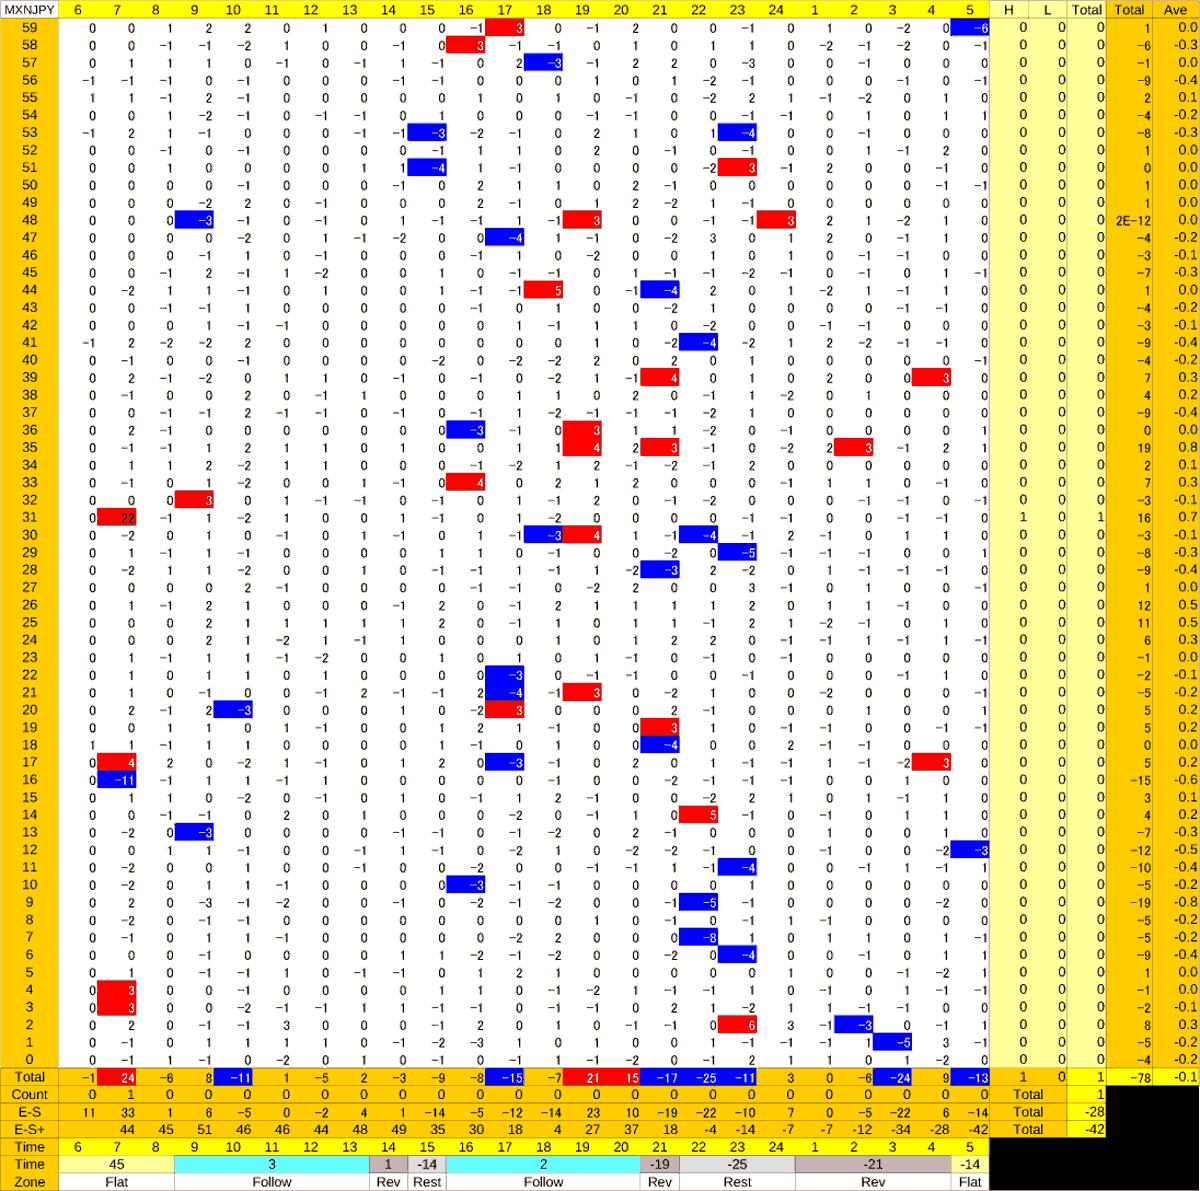 20200803_HS(3)MXNJPY